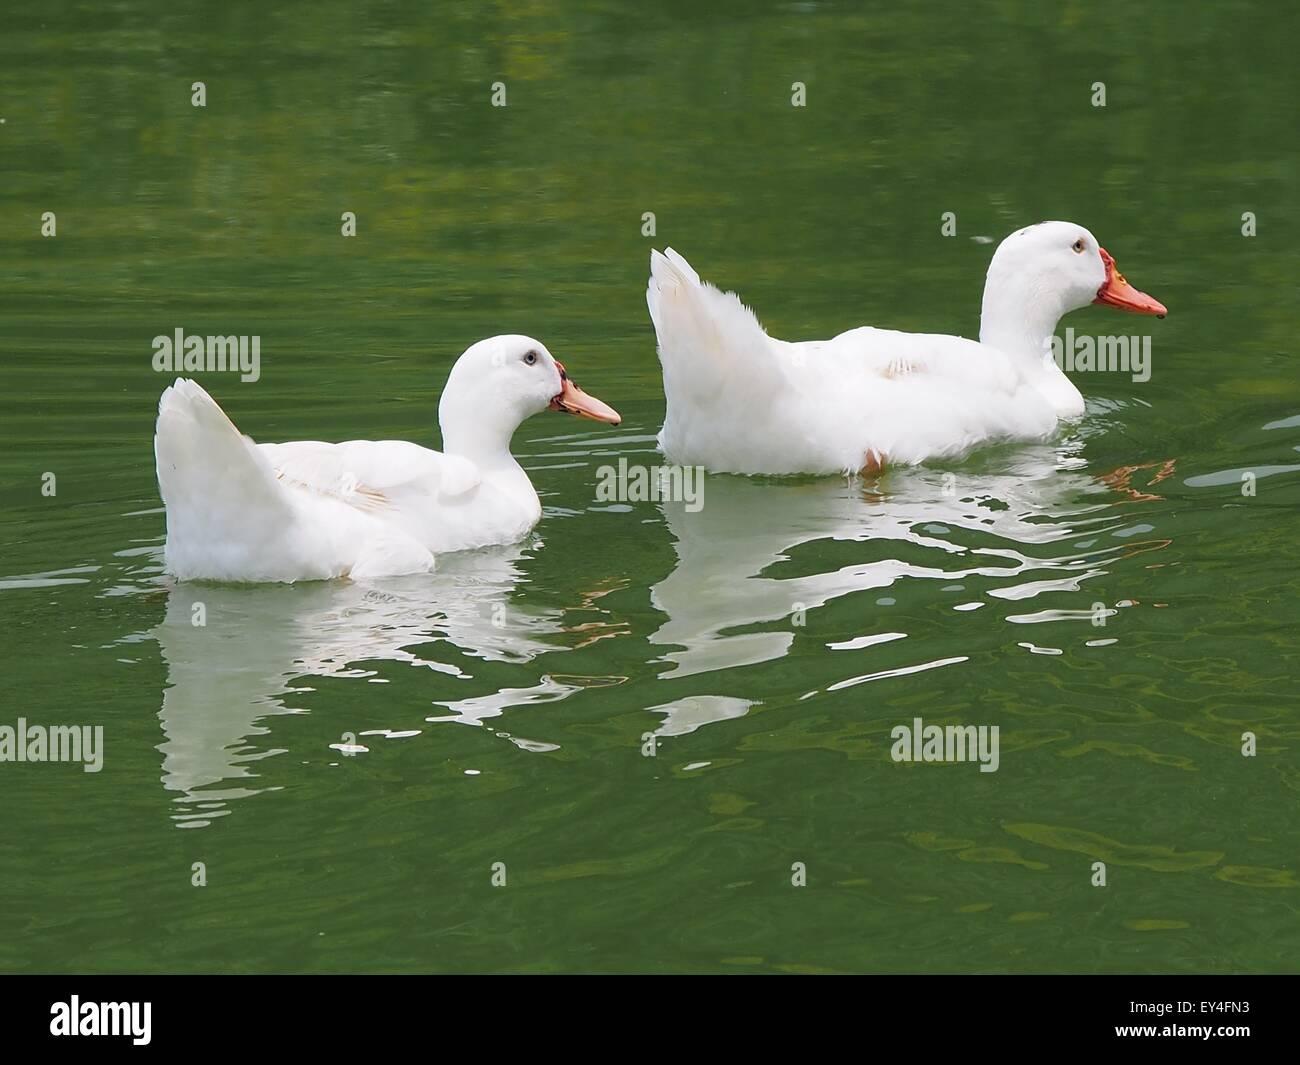 American Pekin ducks on water - Stock Image